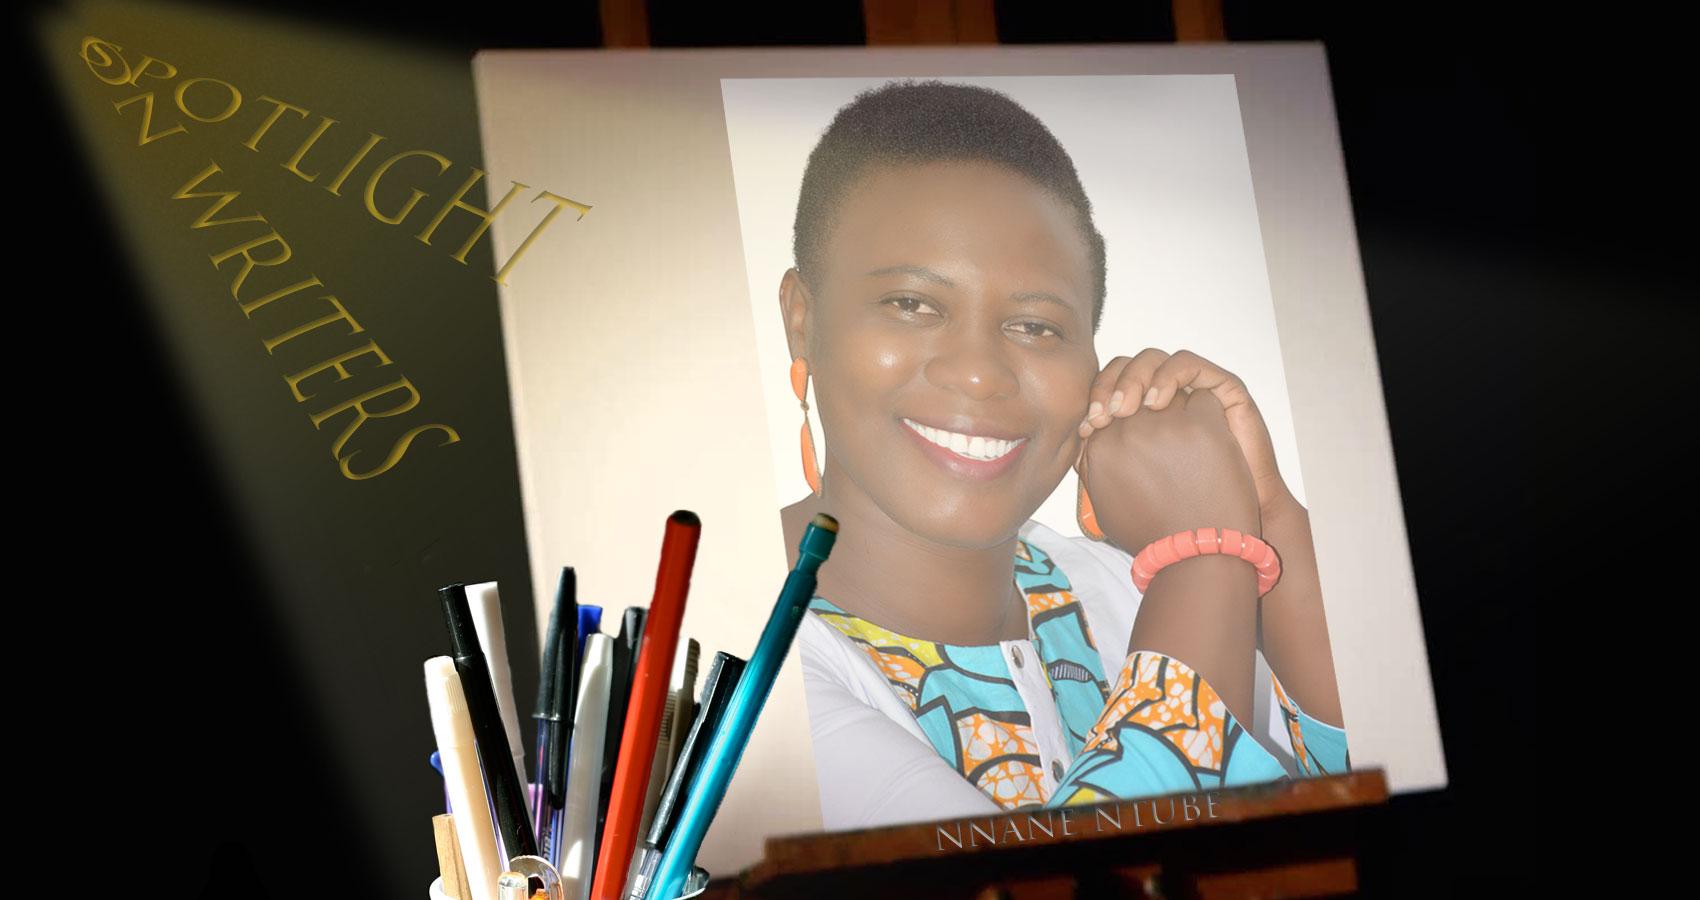 Spotlight On Writers - Nnane Ntube, interview at Spillwords.com